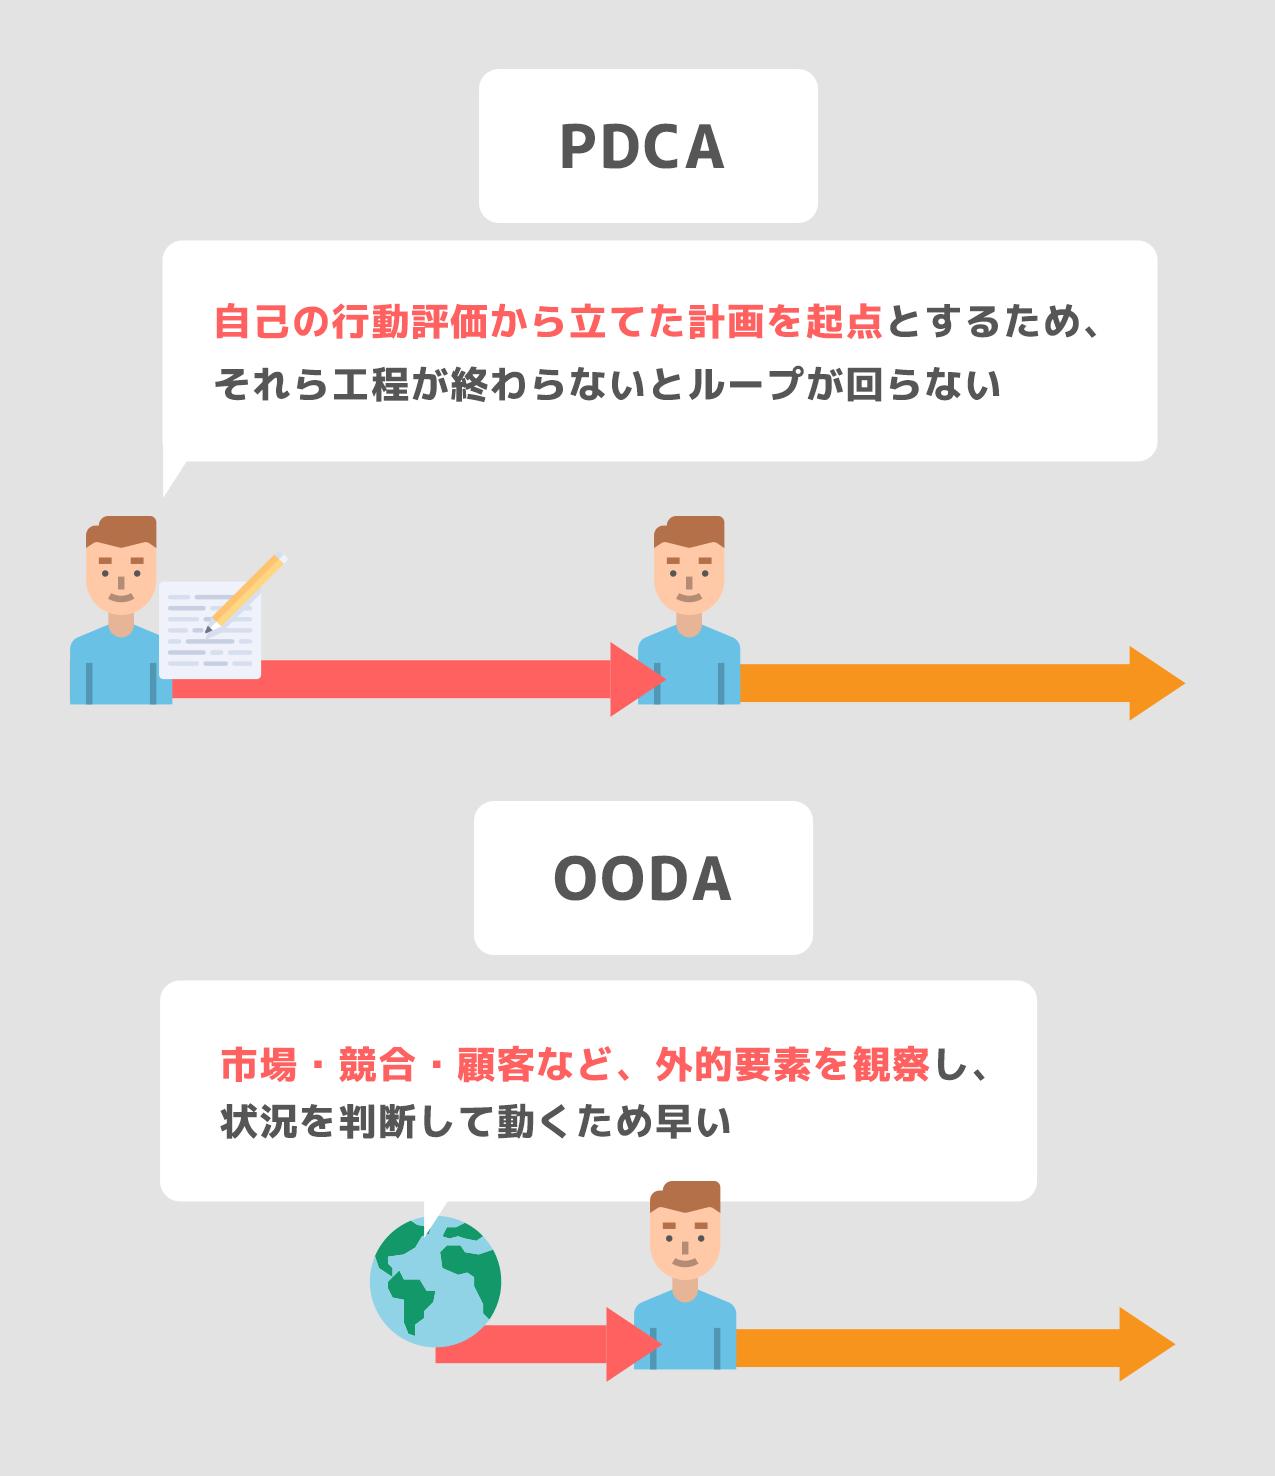 OODAは市場・競合・顧客など、外的要素を観察し、 状況を判断して動くため早い